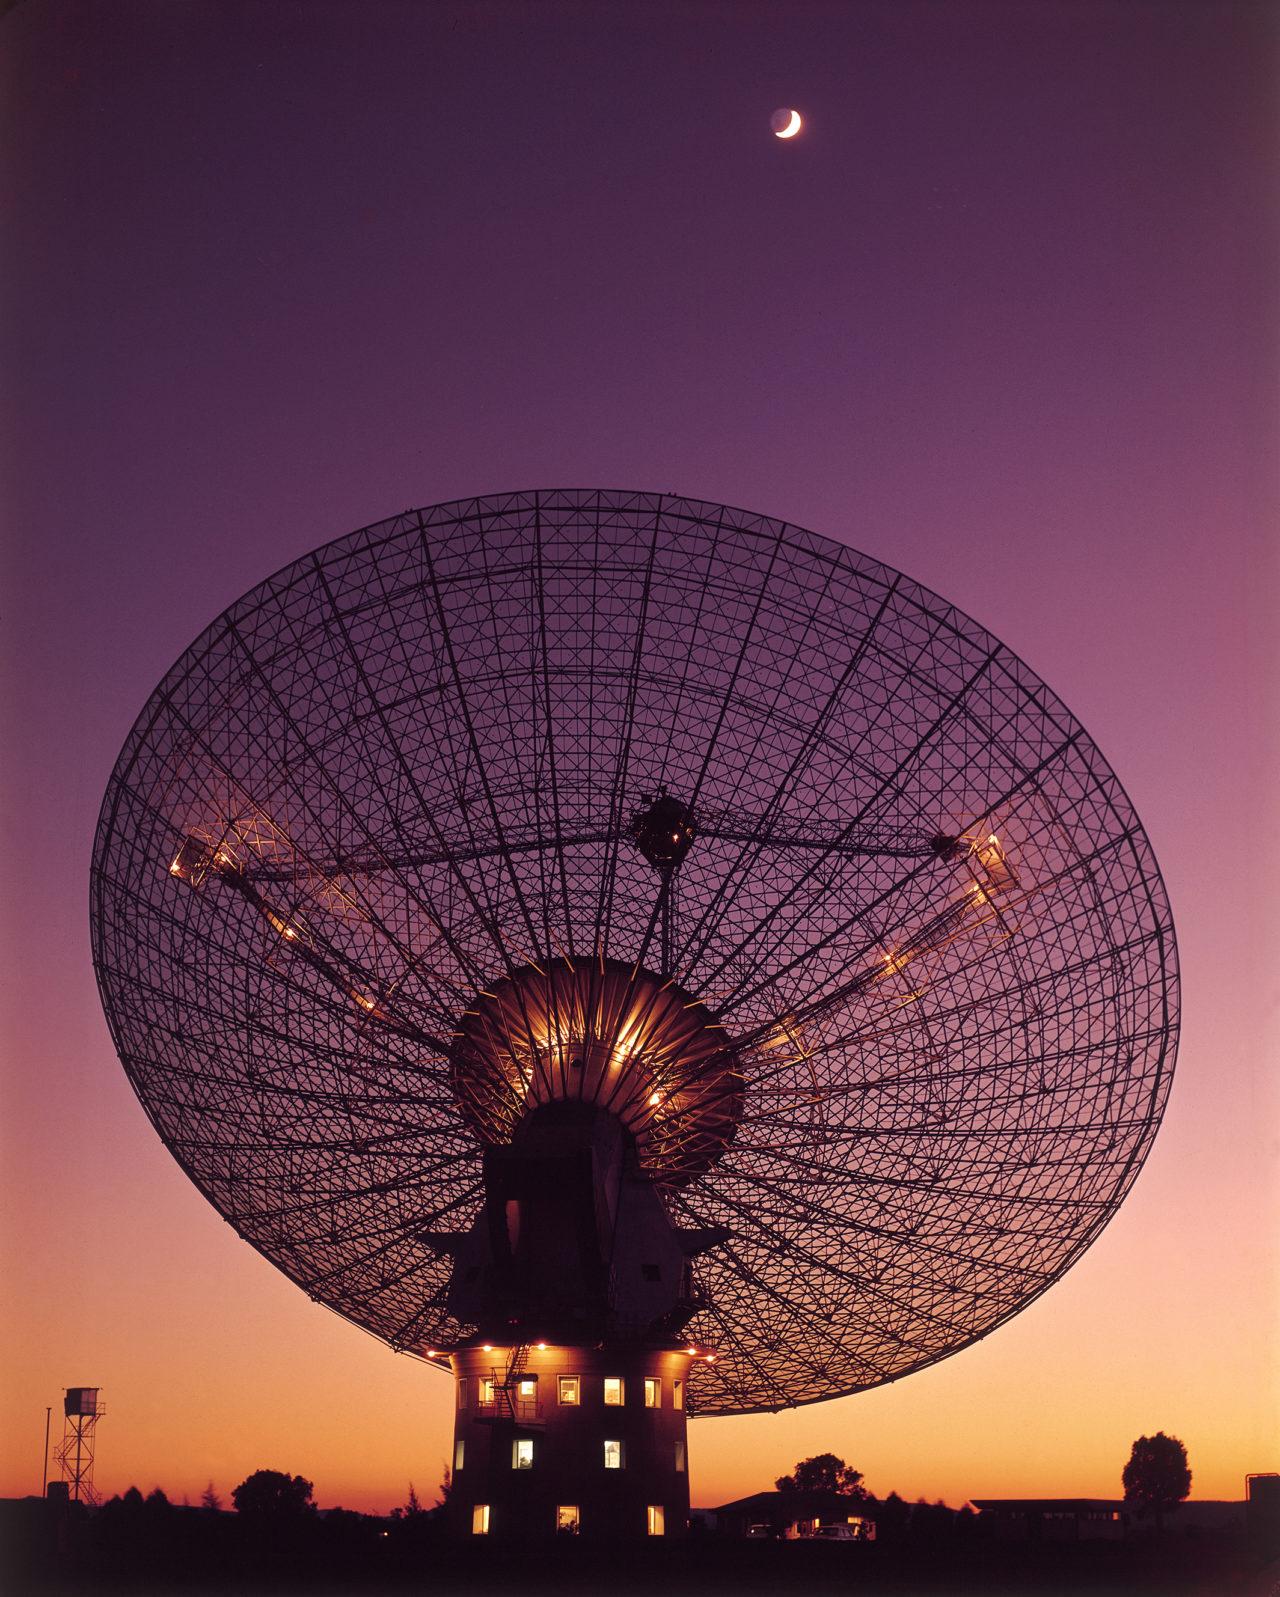 CSIRO Parkes Radio Telescope – Most Beautiful Picture